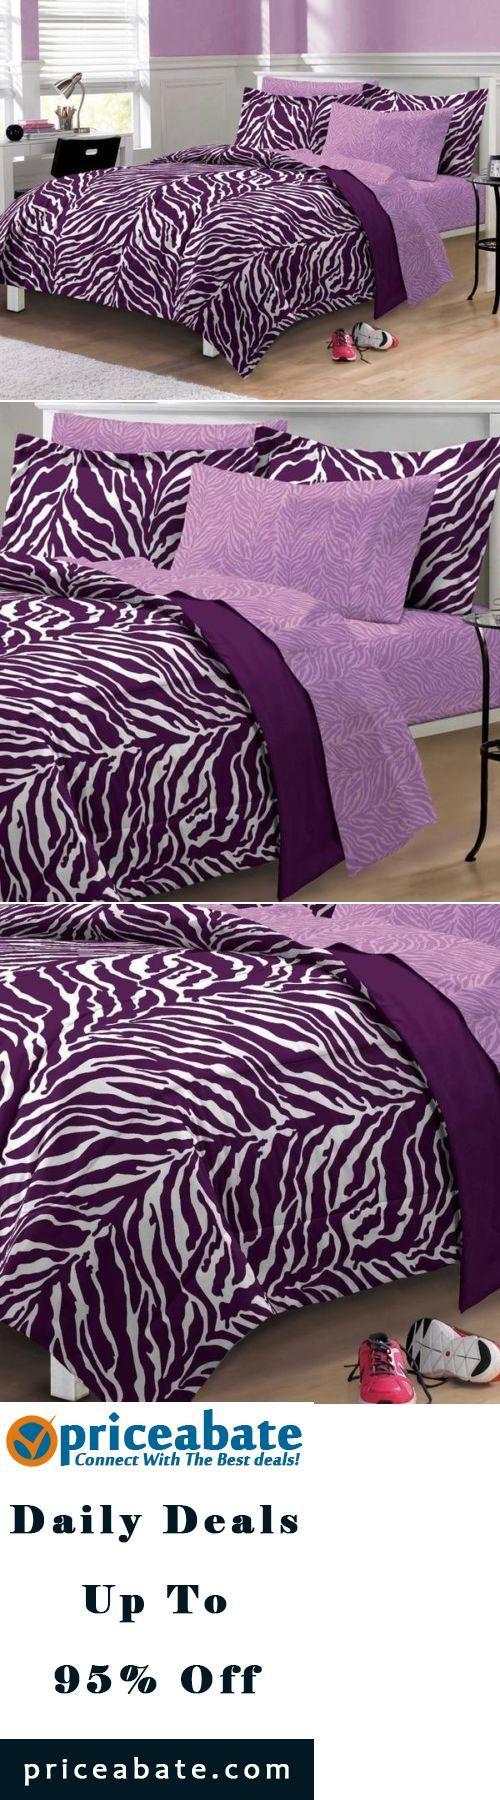 #blackfriday #blackfridaydeals #blackfridaysales Teen Girls Purple Zebra Stripe 7 PC FULL / DOUBLE Comforter Sheets Bedding Set - Buy This Item Now For Only: $79.95